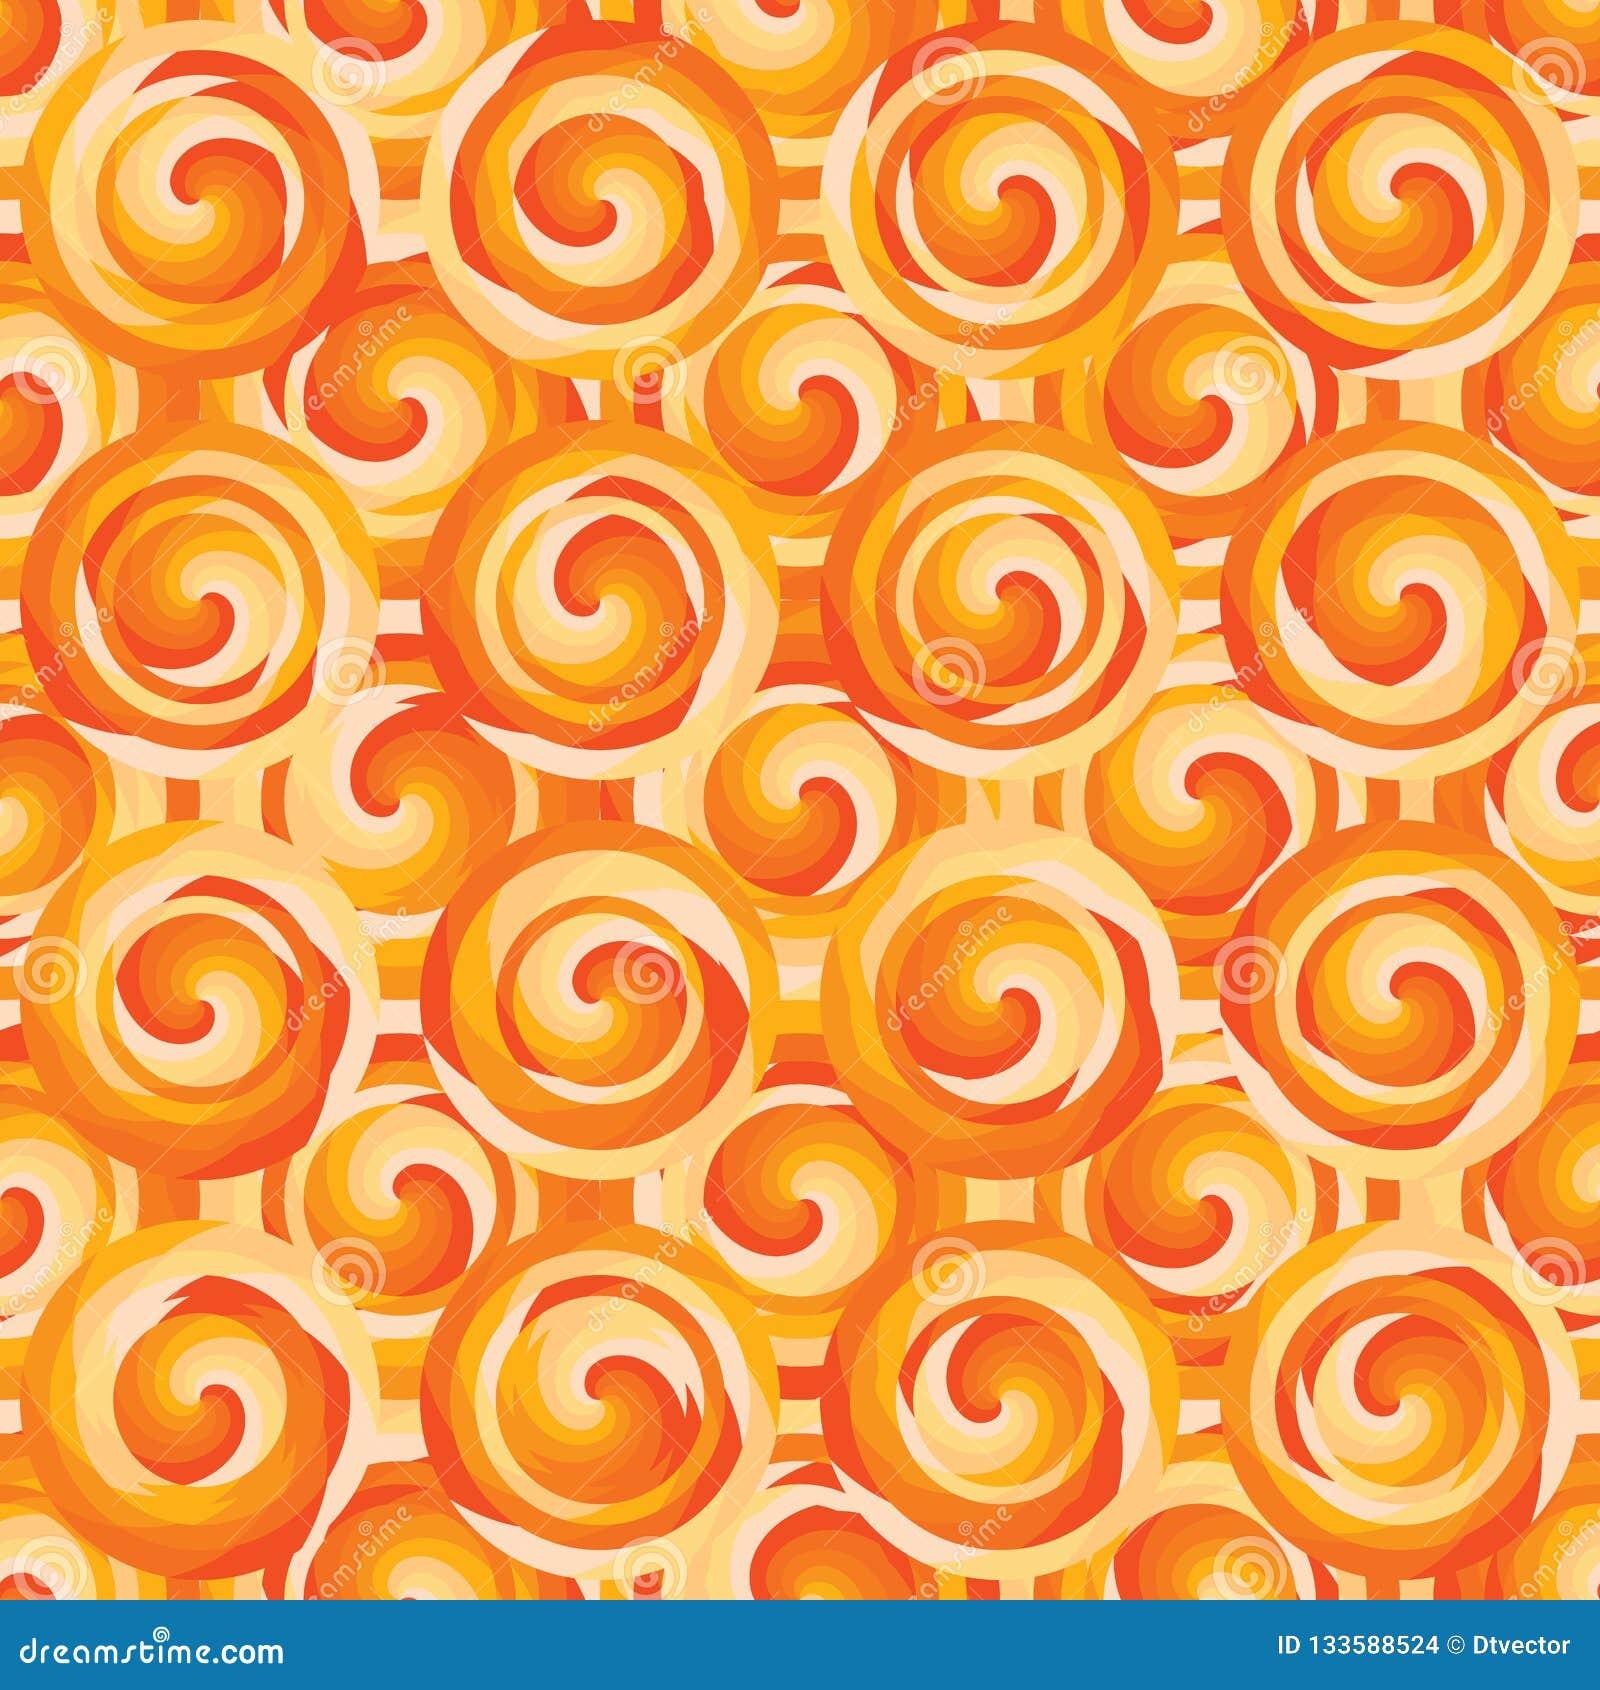 Van de de cirkellaag van de cirkelwerveling oranje de symmetrie naadloos patroon